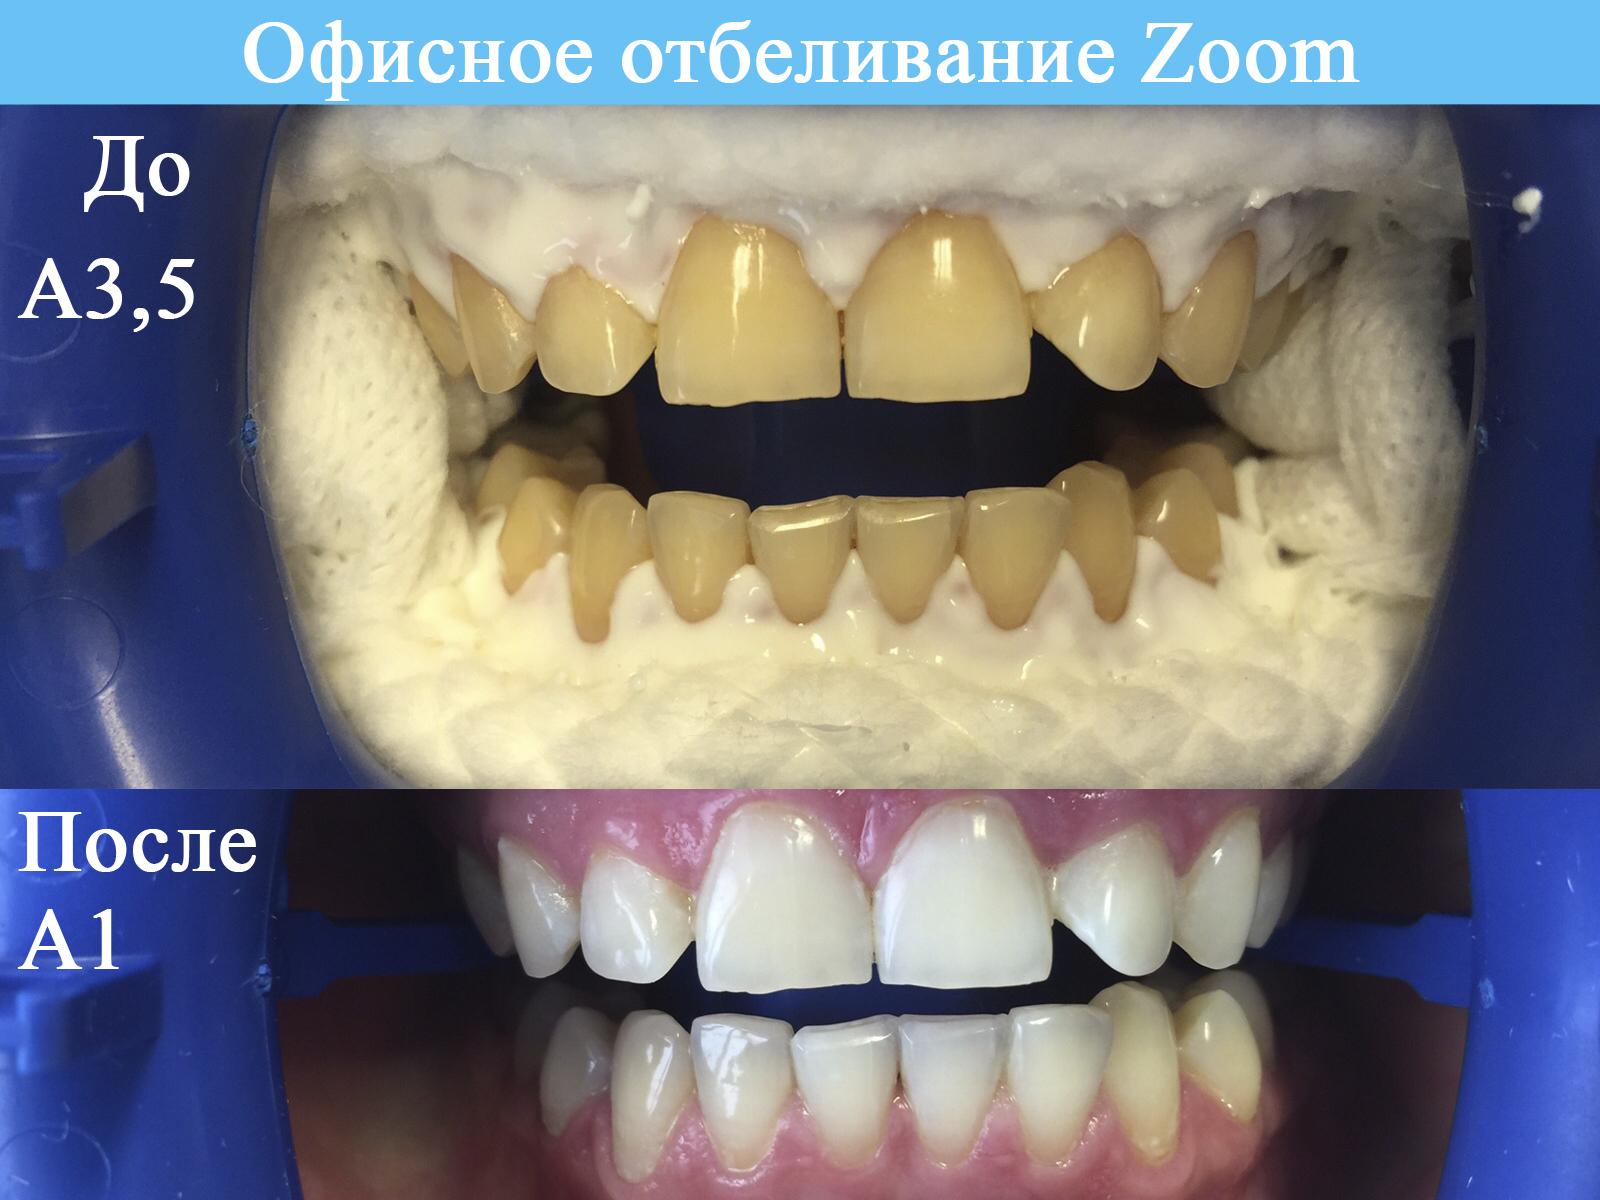 Отбеливание Zoom до и после